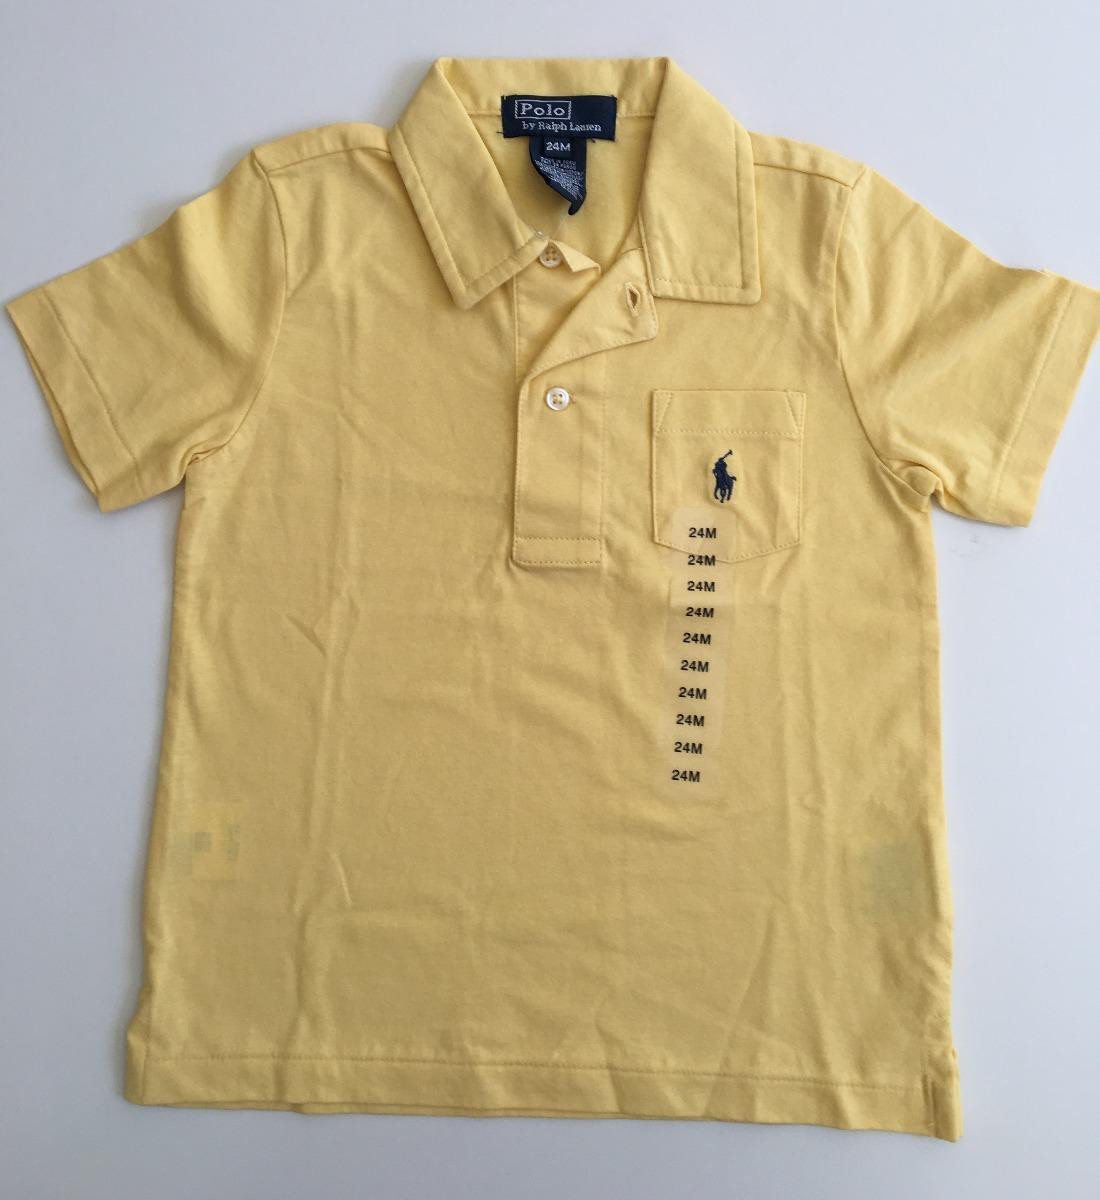 ralph lauren camisa polo m c malha amarela 24m nova c etiq. Carregando zoom. 3a14a382f78